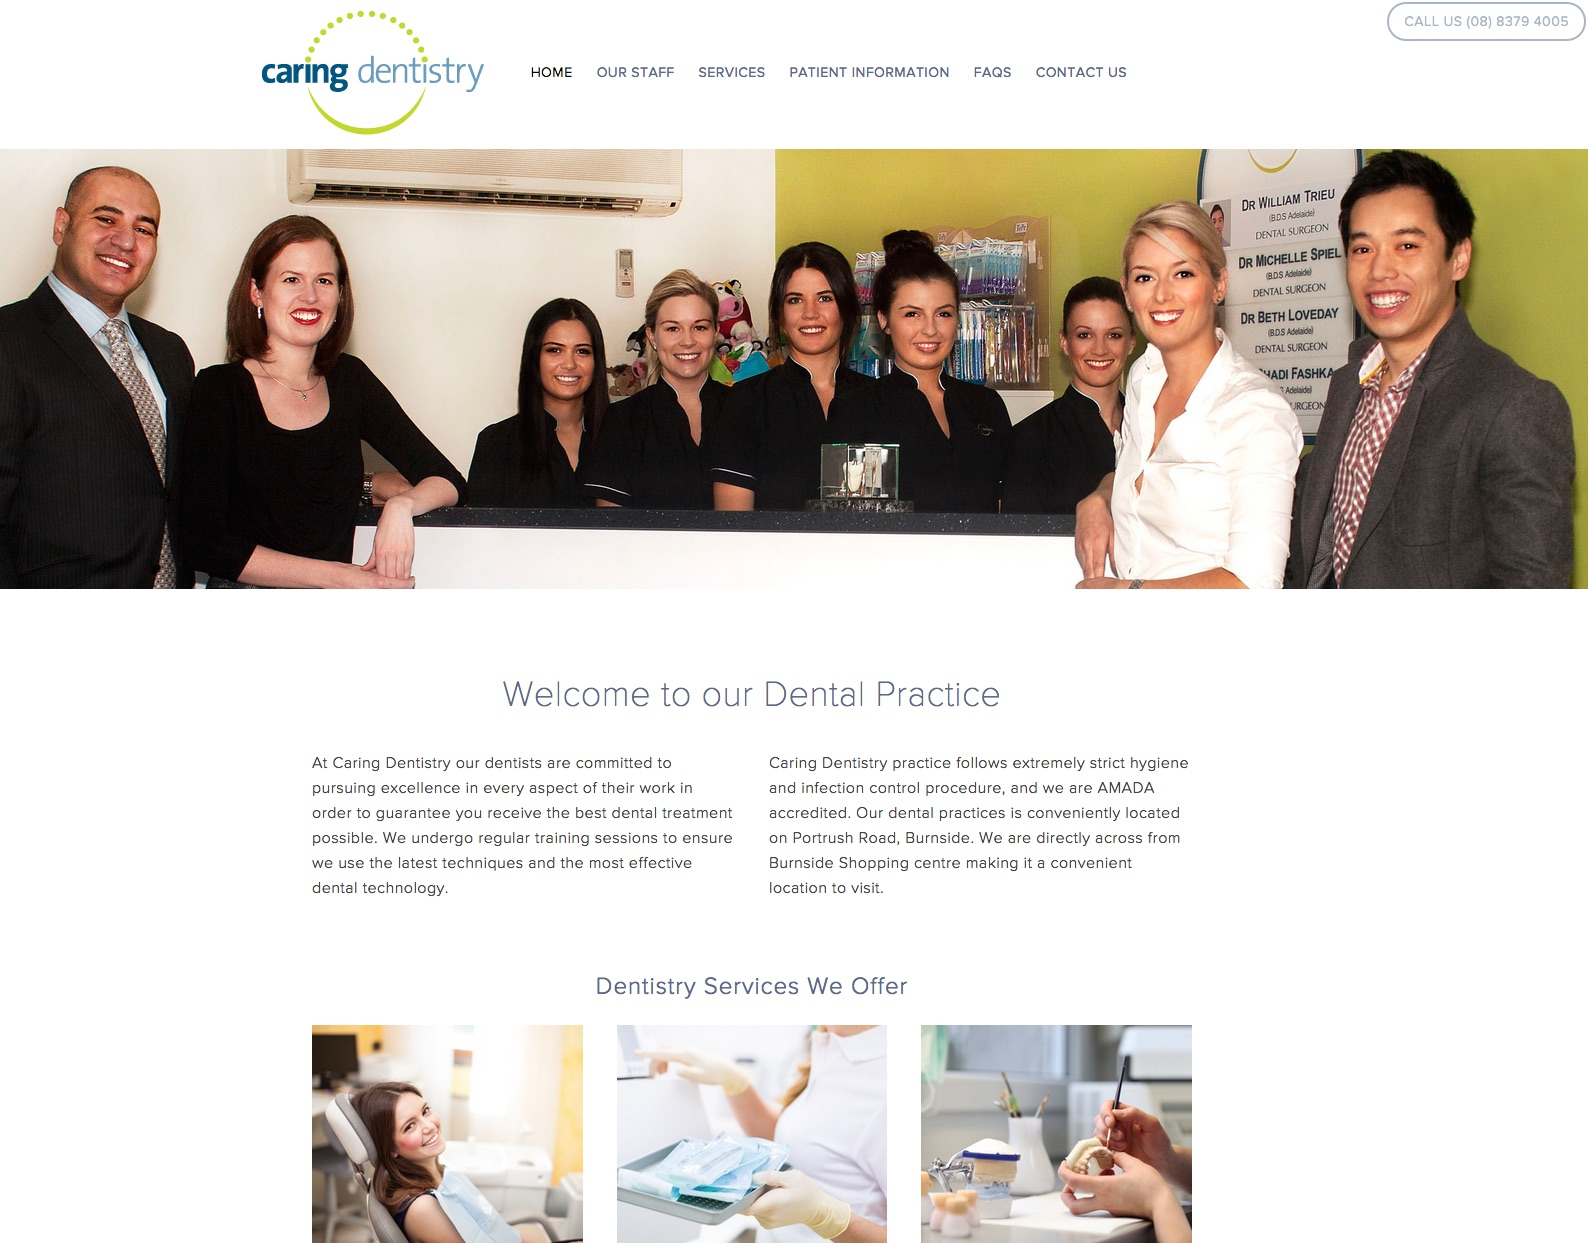 Caring Dentistry are a local customer of Llamablue  www.caringdentistry.com.au